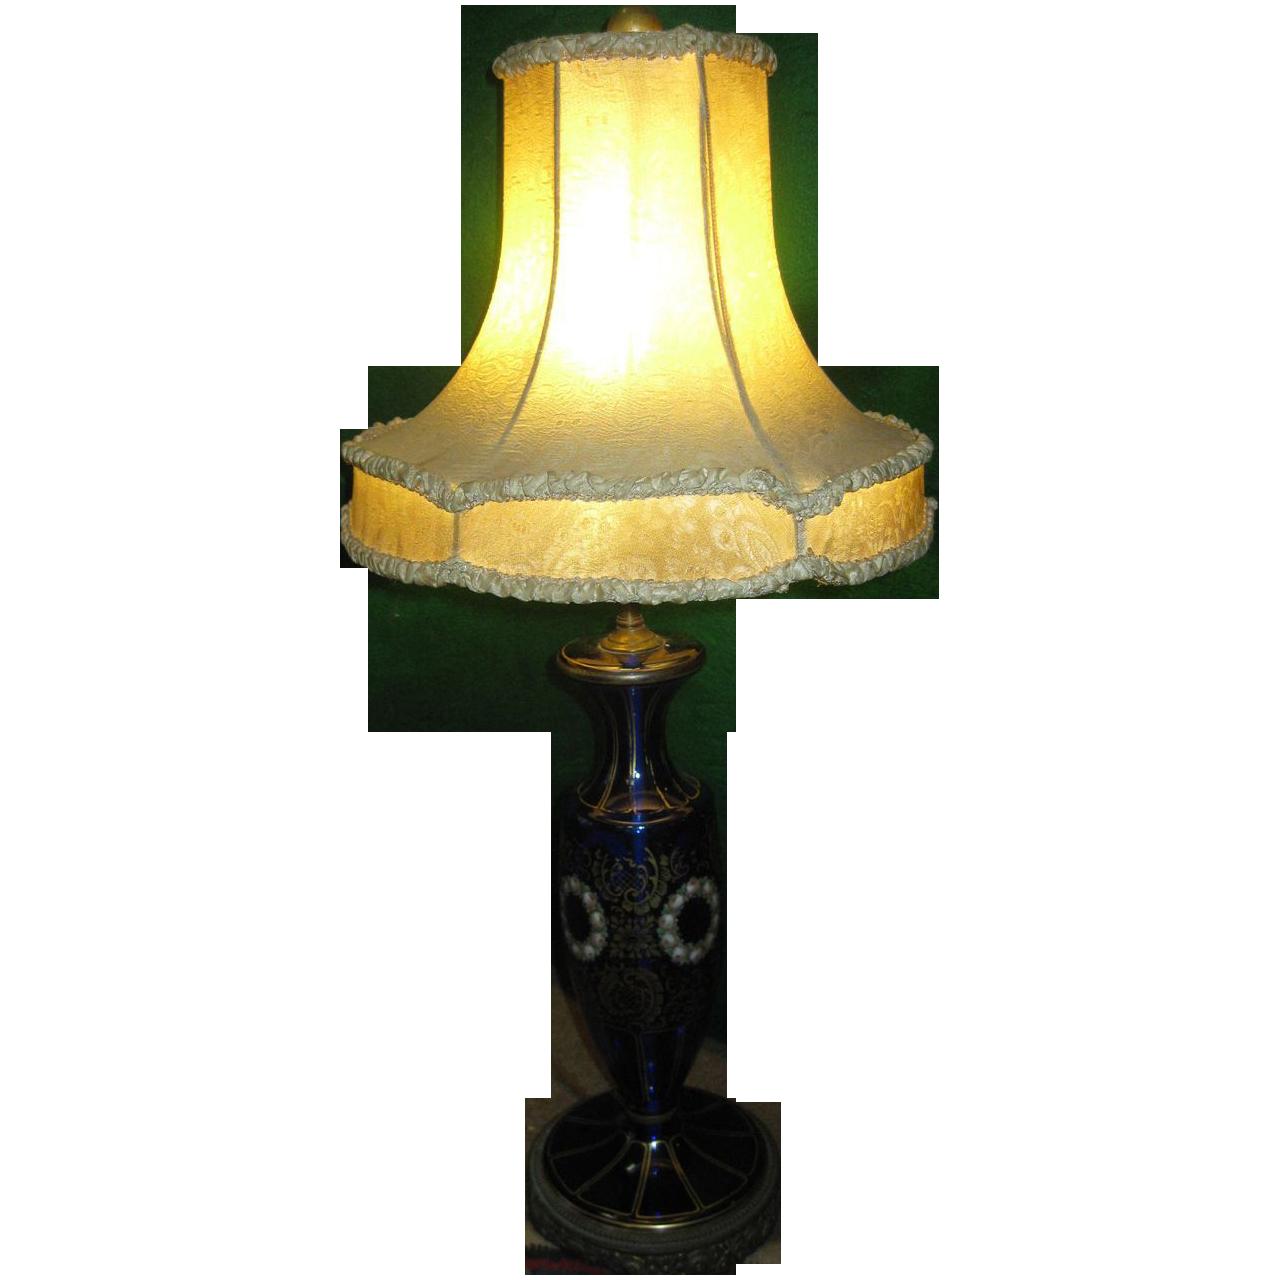 vintage cobalt blue glass table lamp from savannahgalleries on ruby. Black Bedroom Furniture Sets. Home Design Ideas